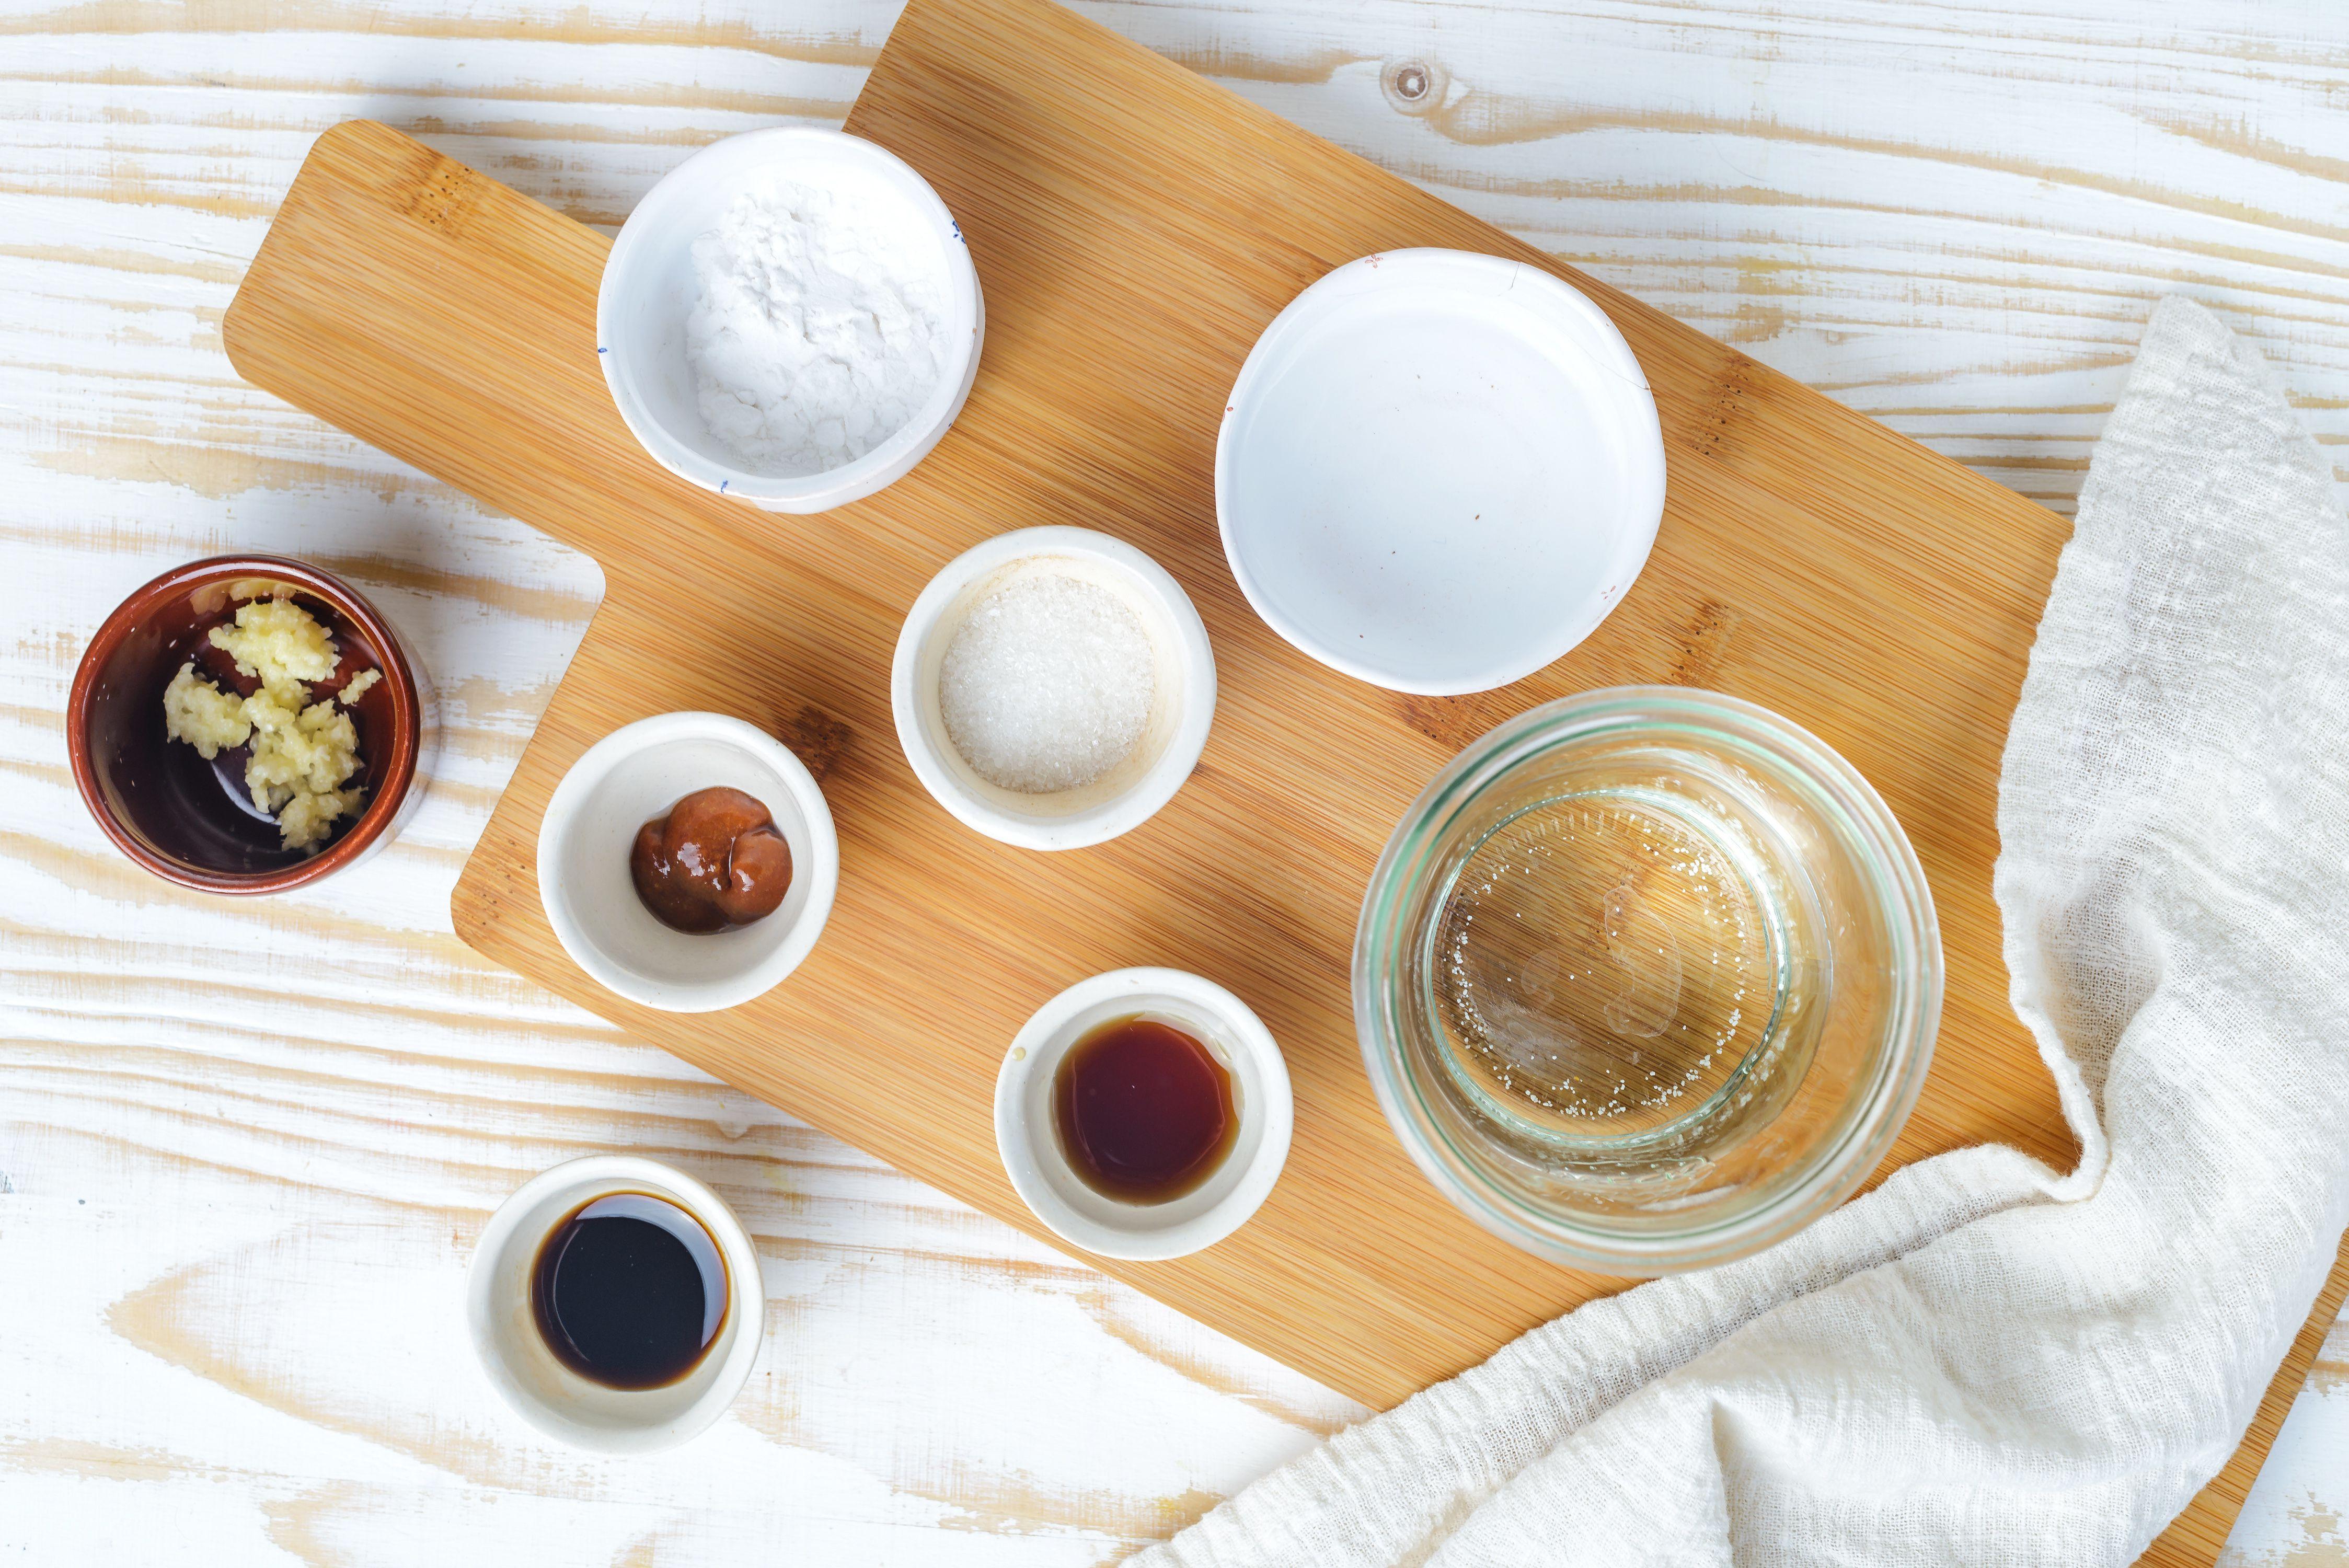 Ingredients for tamarind dipping sauce